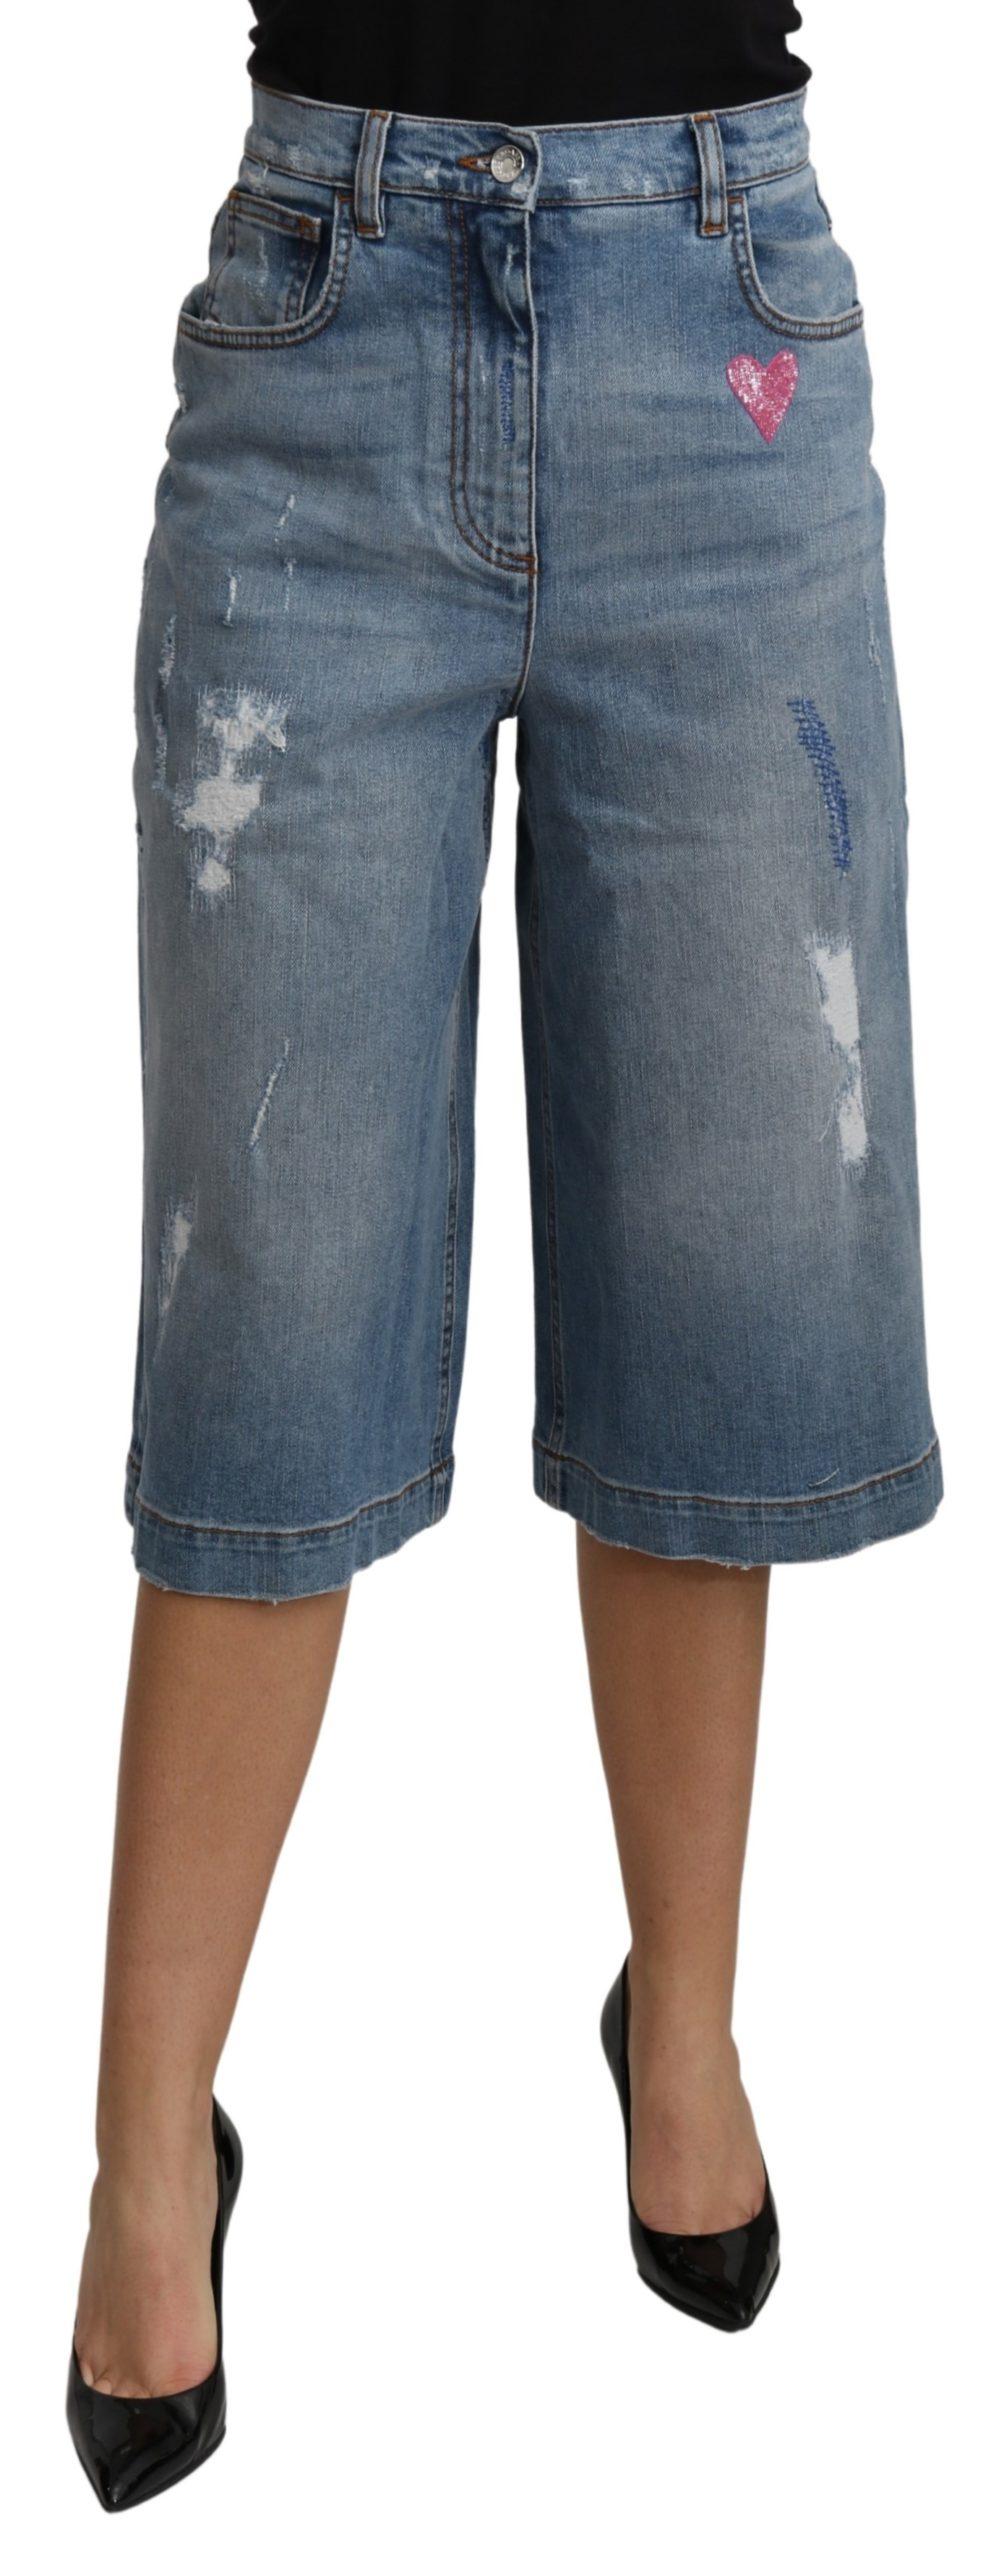 Dolce & Gabbana Women's Wide Leg Mid Waist Cotton Jeans Blue PAN70978 - IT40 S